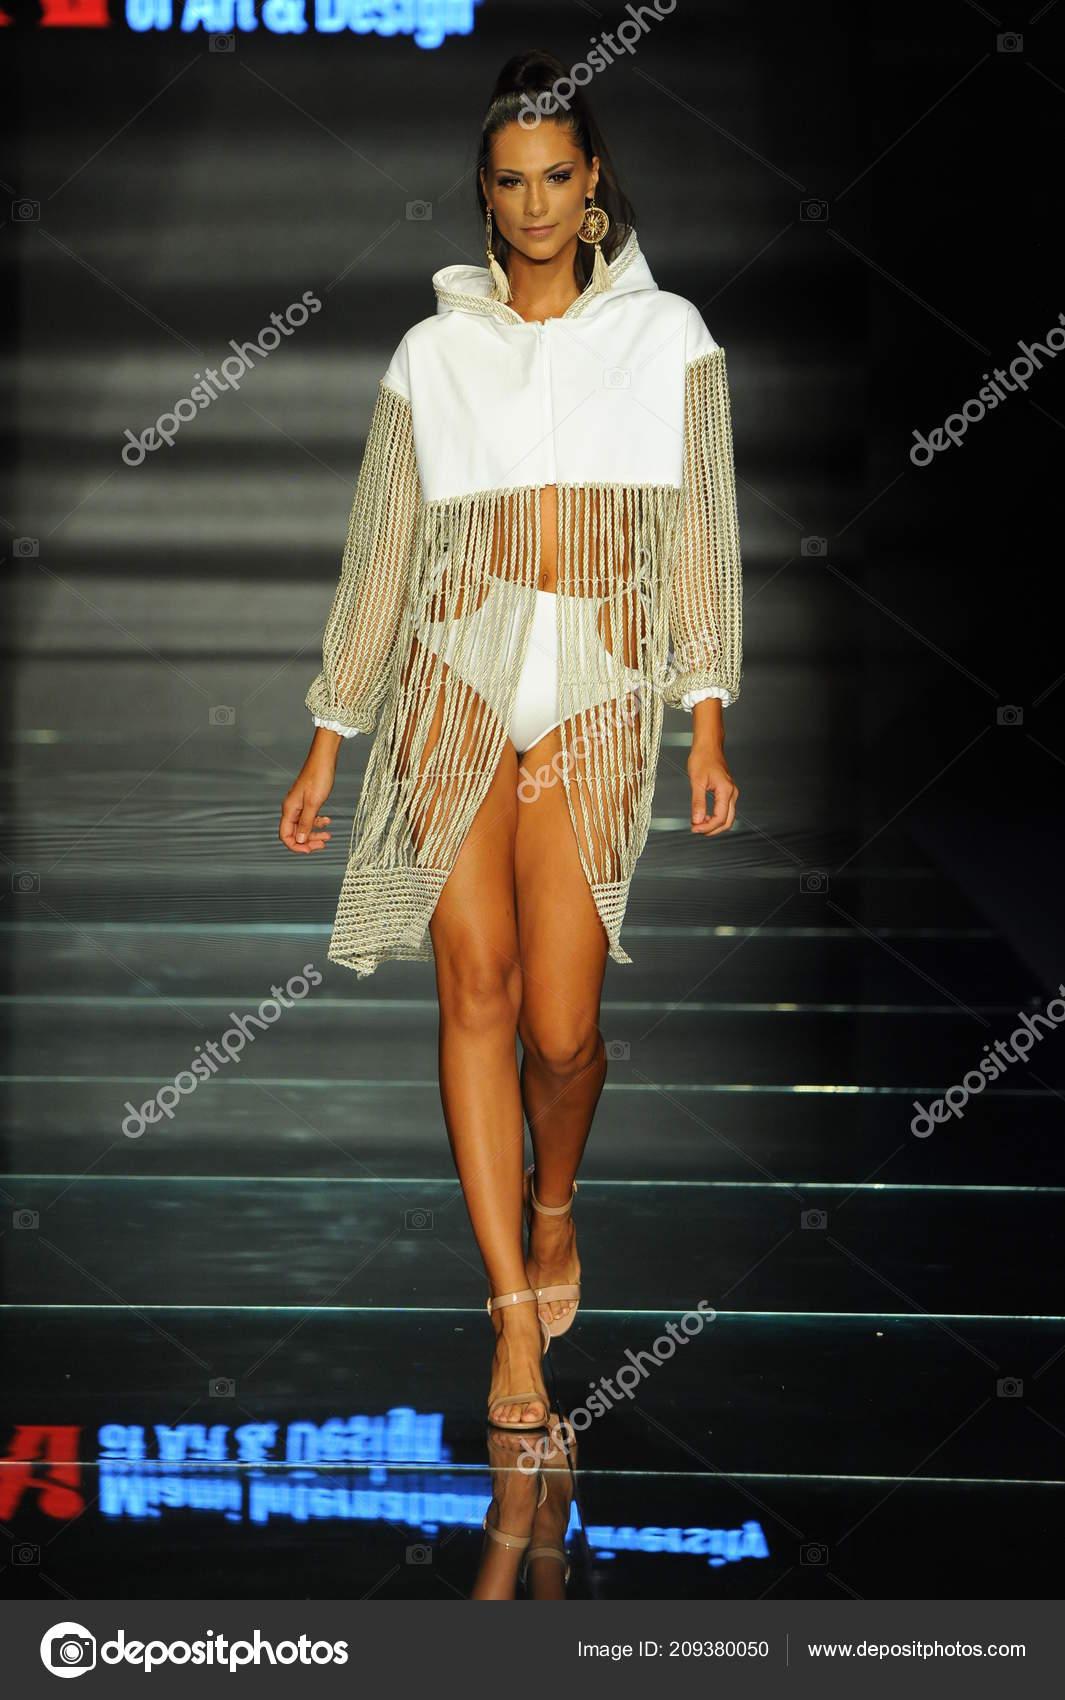 Miami Beach July Model Wears Fashions Design Students Miami International Stock Editorial Photo C Fashionstock 209380050